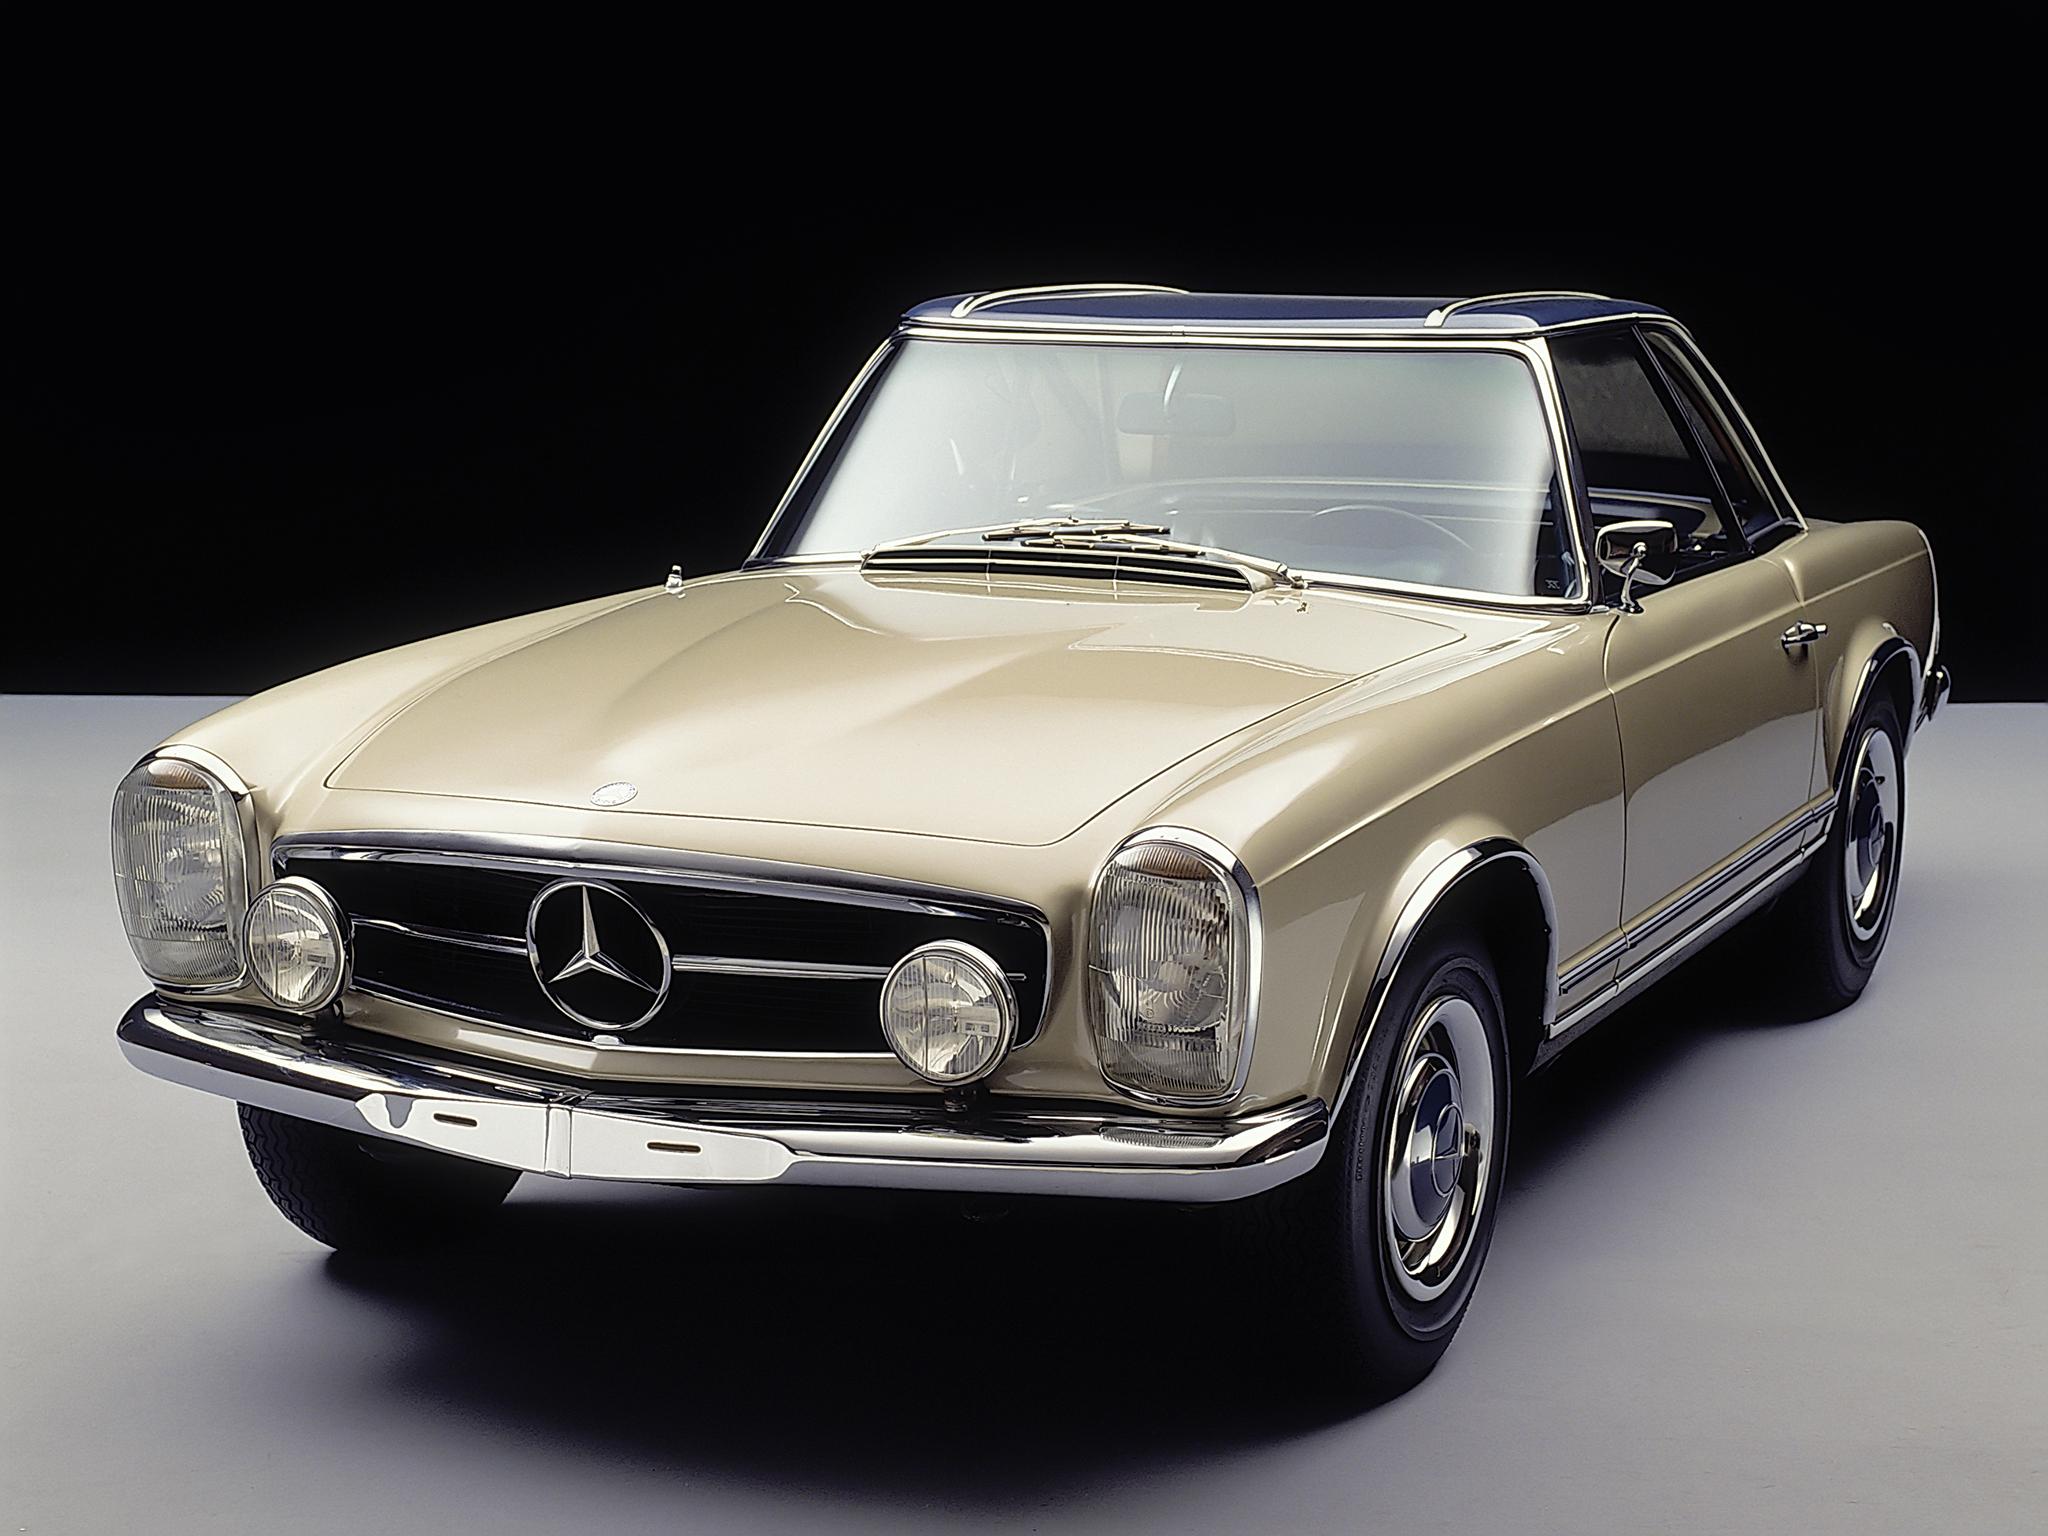 1965 mercedes benz 230 sl w113 luxury classic s l kf for Mercedes benz w113